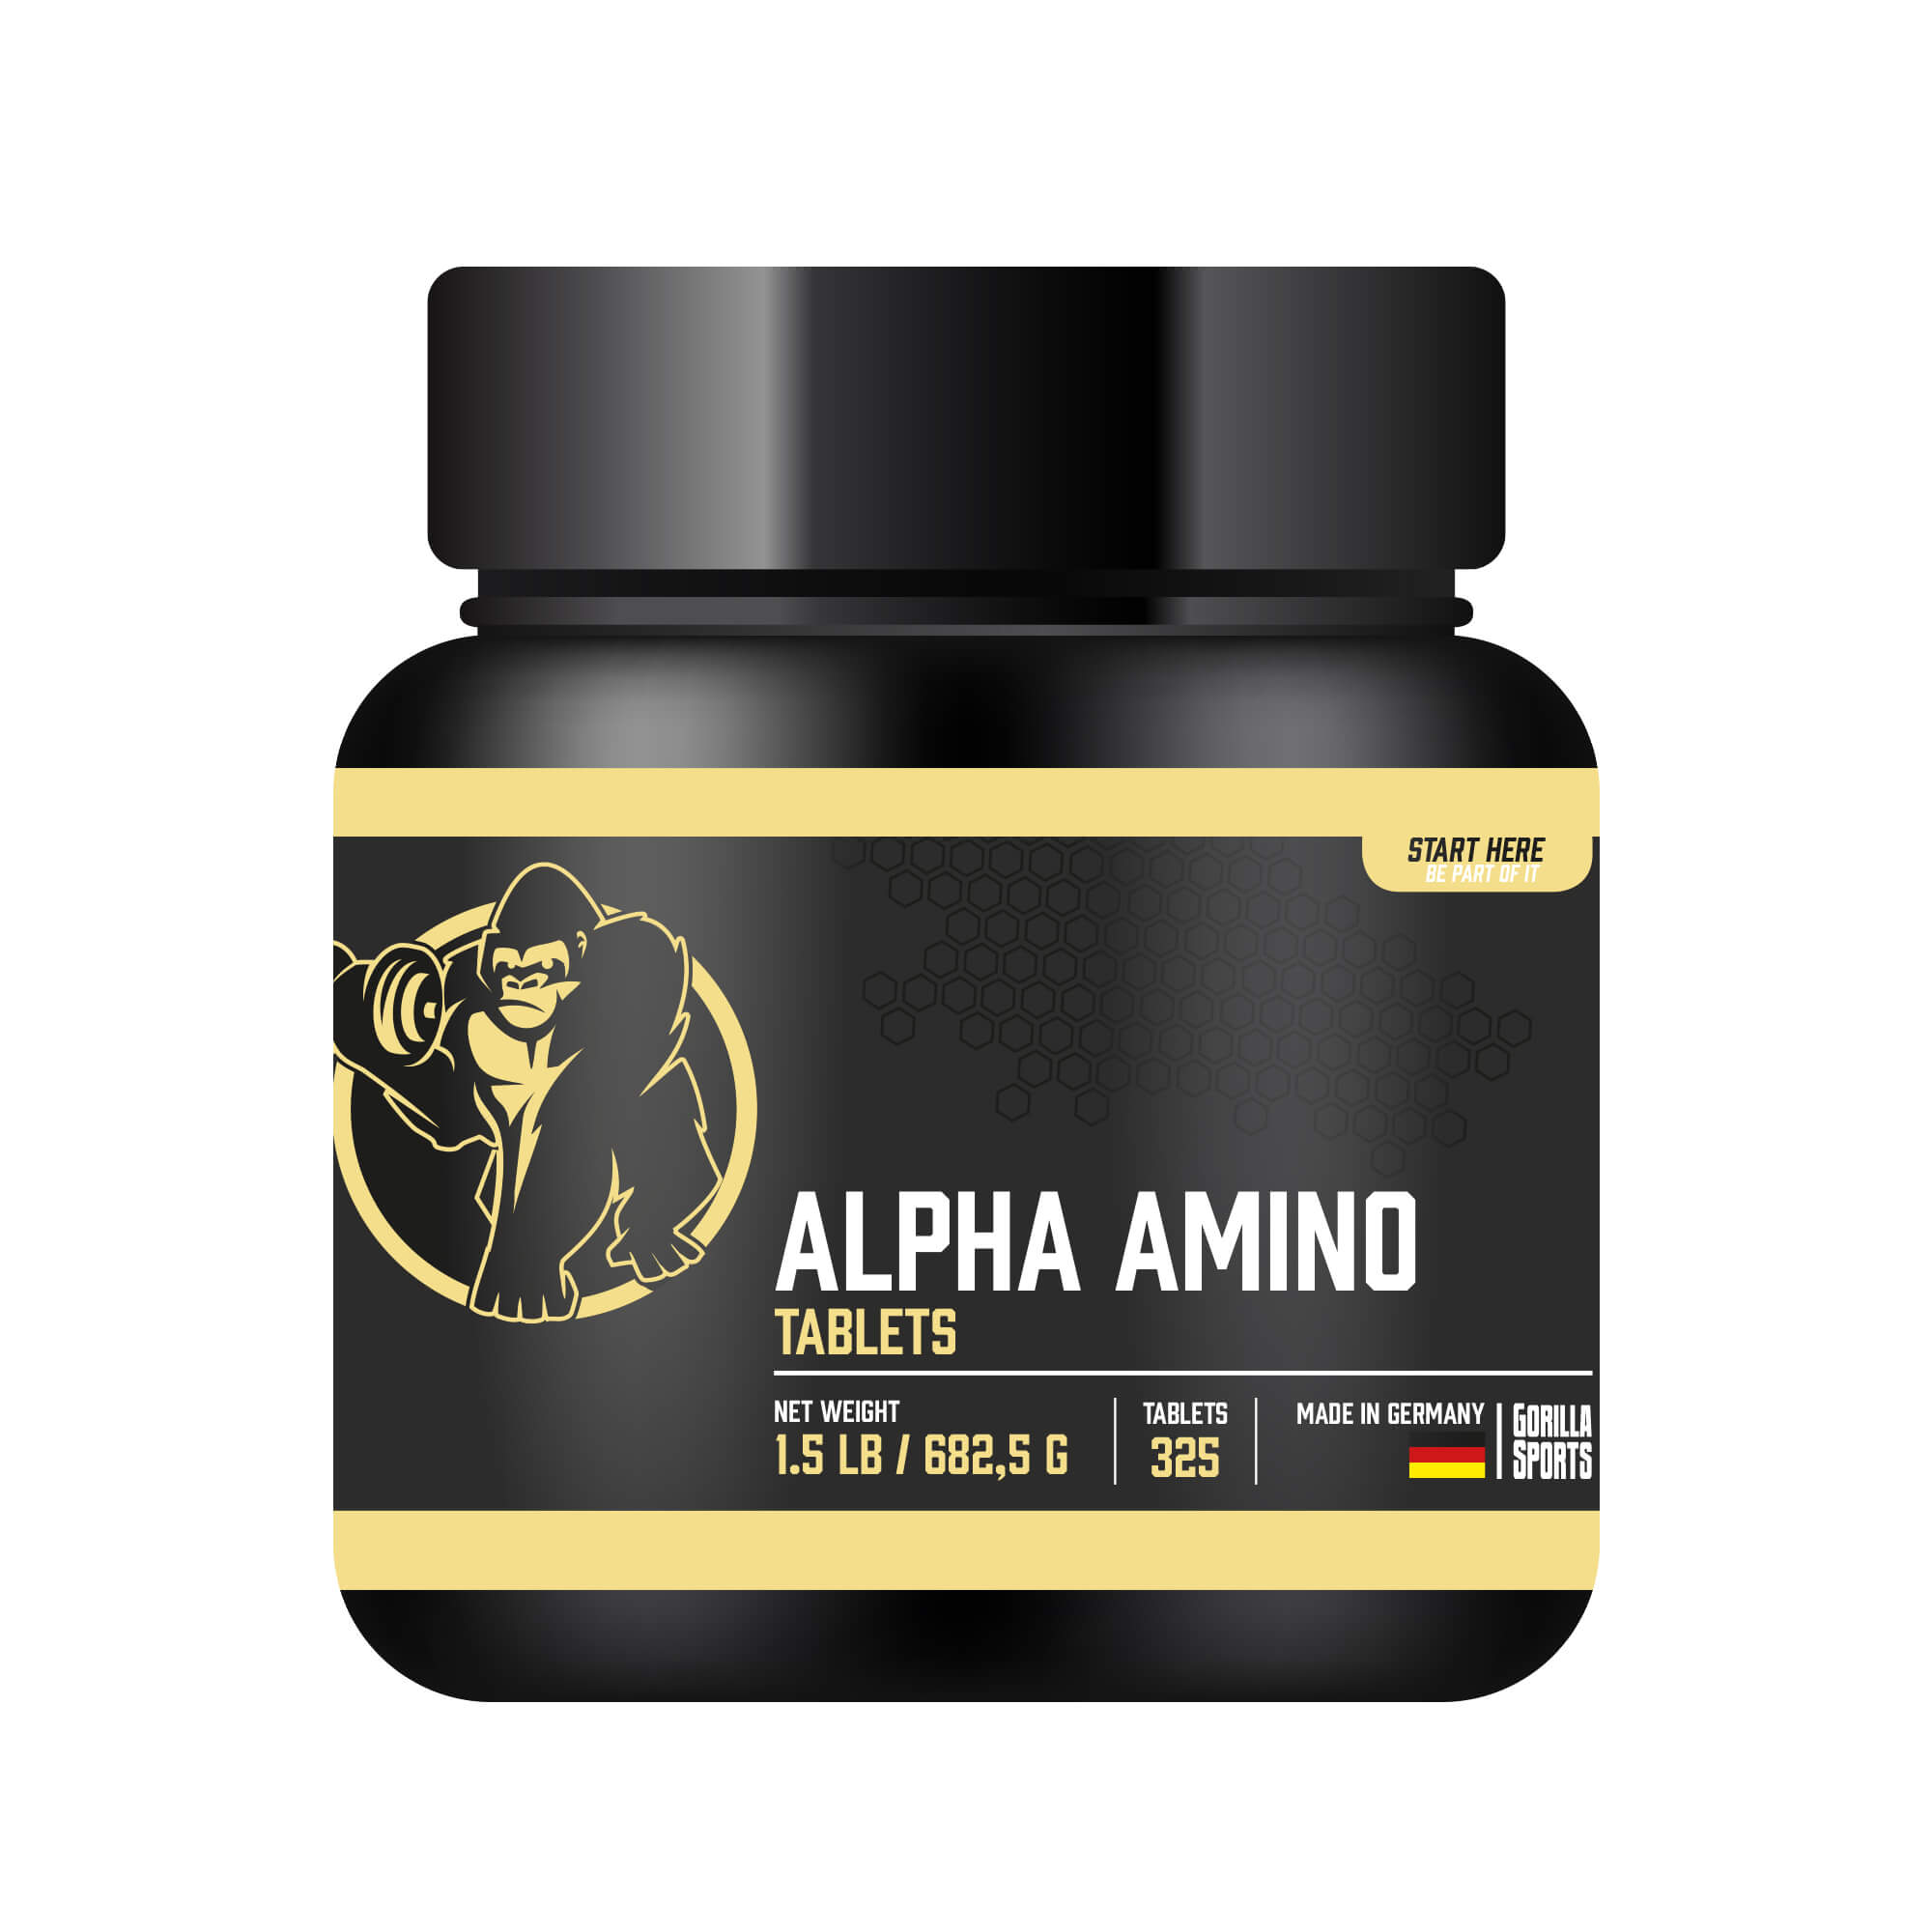 Gorilla Sports Alpha Amino 325 Tabletten 300008-00116-0206